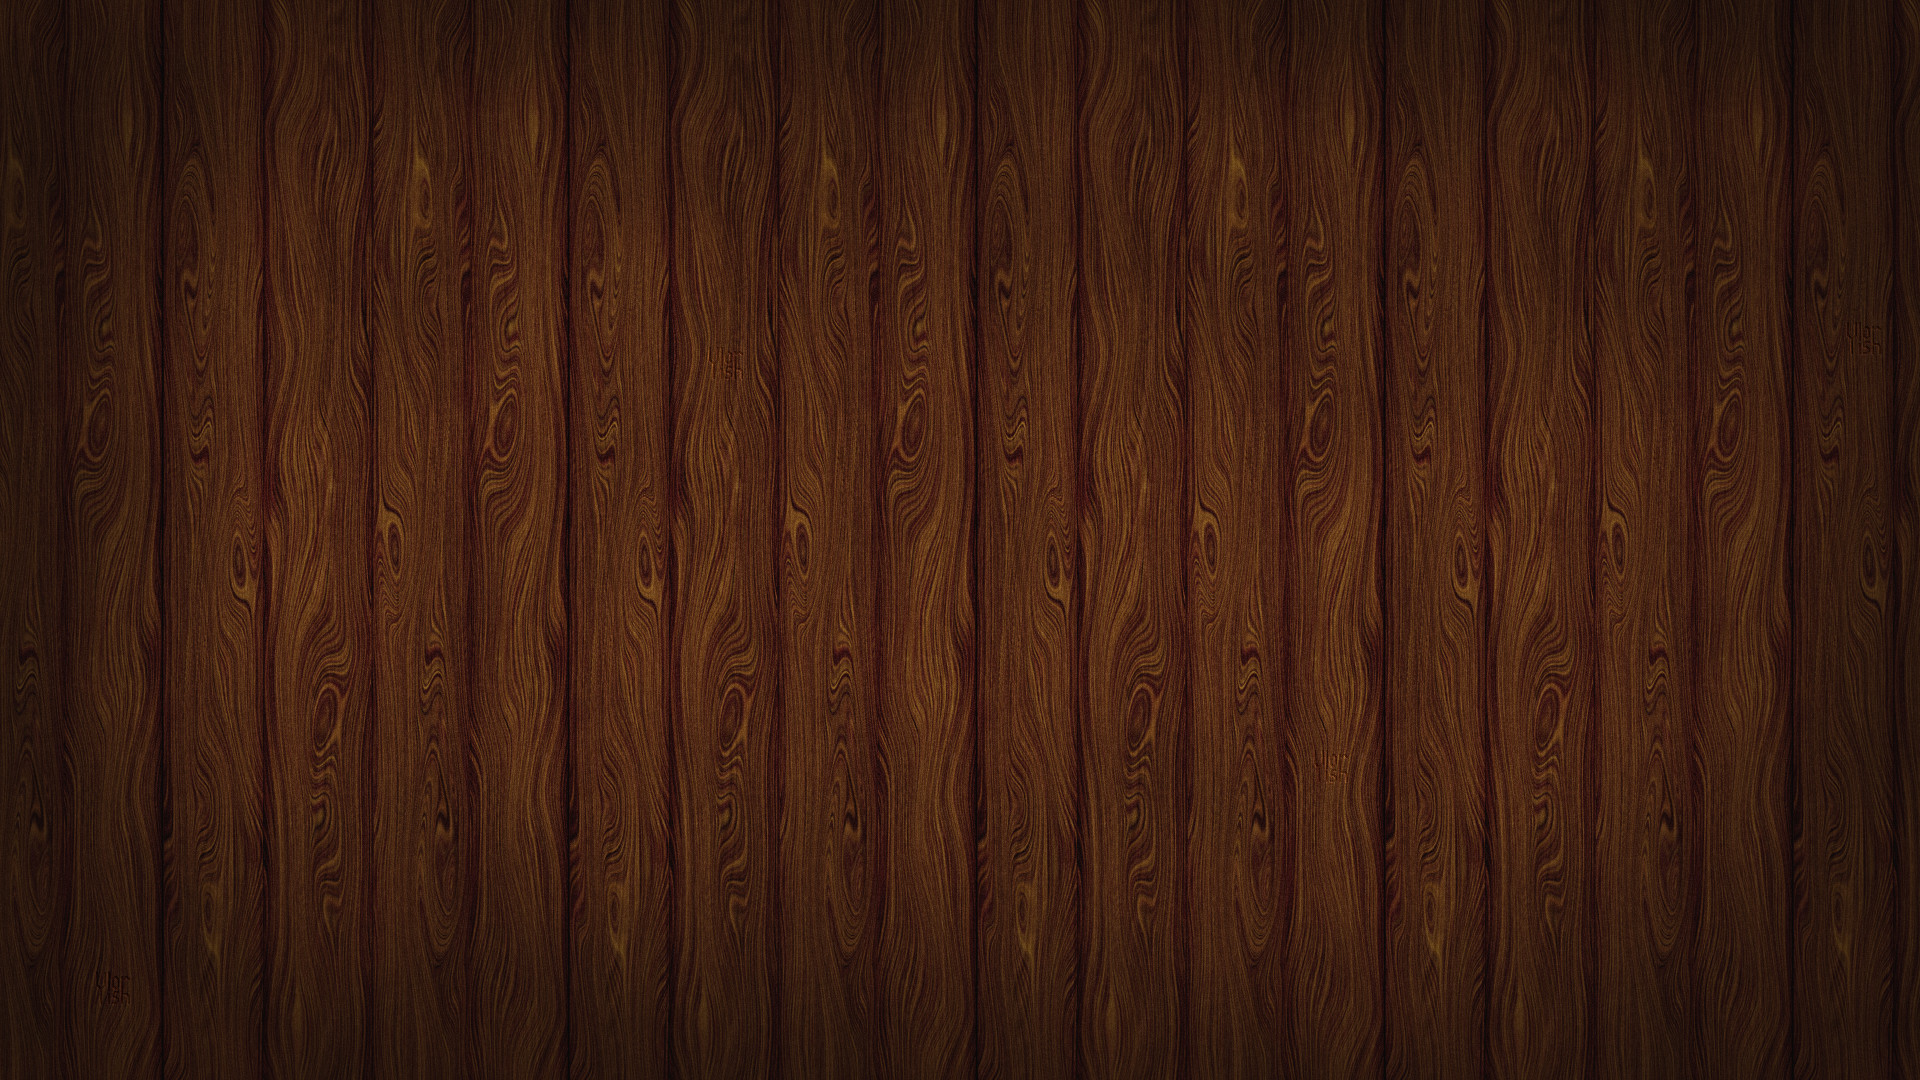 Wood Texture – HD Quality Pic